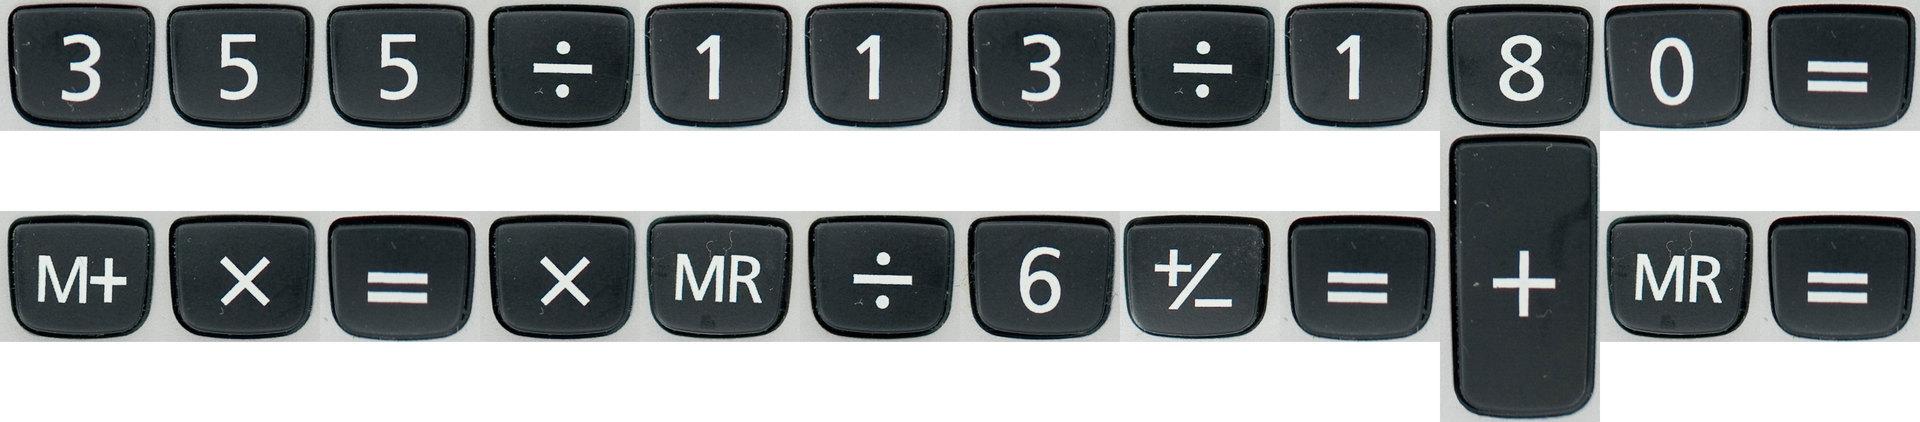 355 / 113 / 180 = MC M+ * = * MR / 6 +- = + MR =